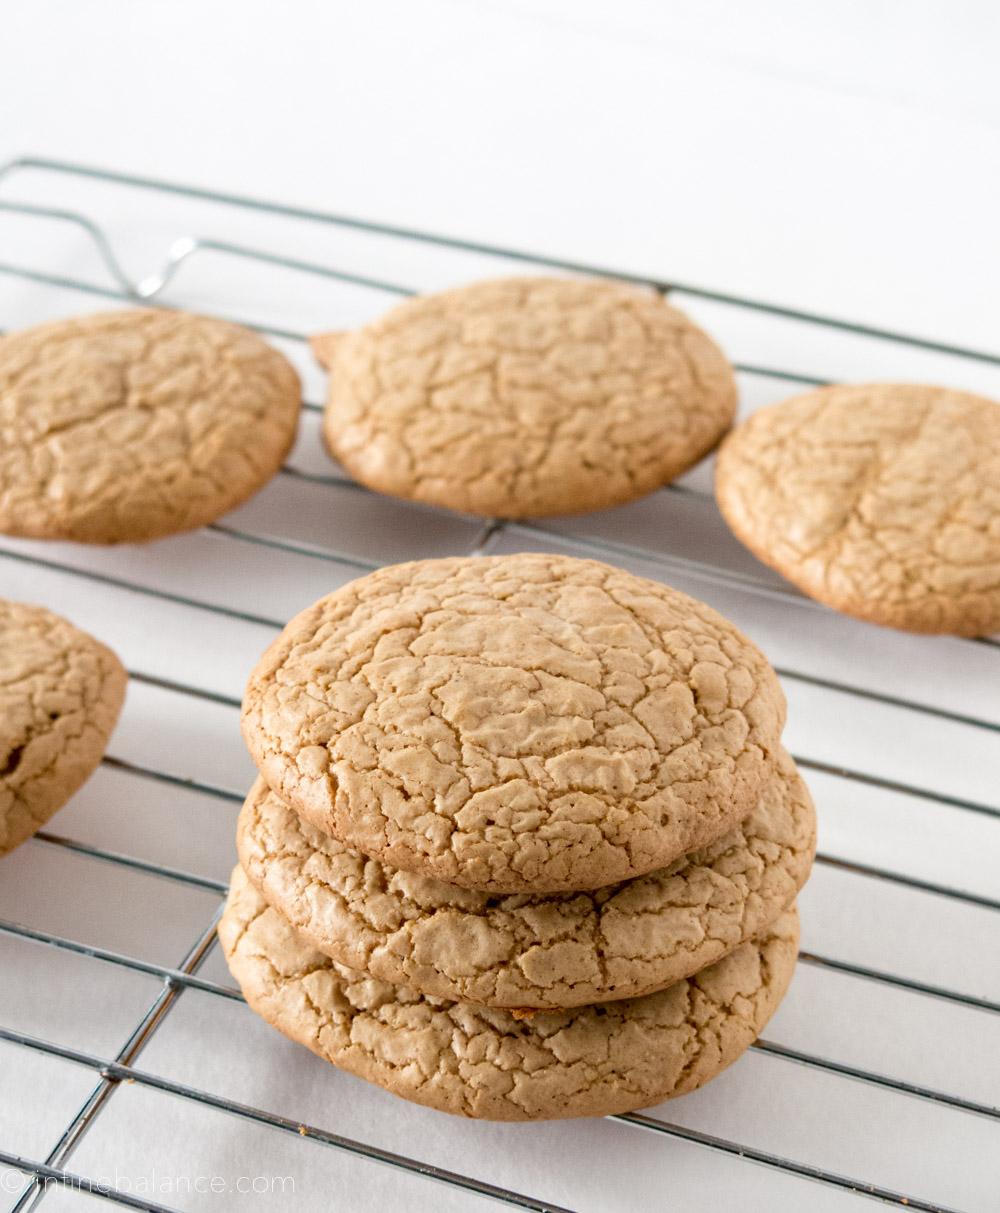 Peanut Butter Crinkle Cookies | infinebalance.com #gluten-free #recipe